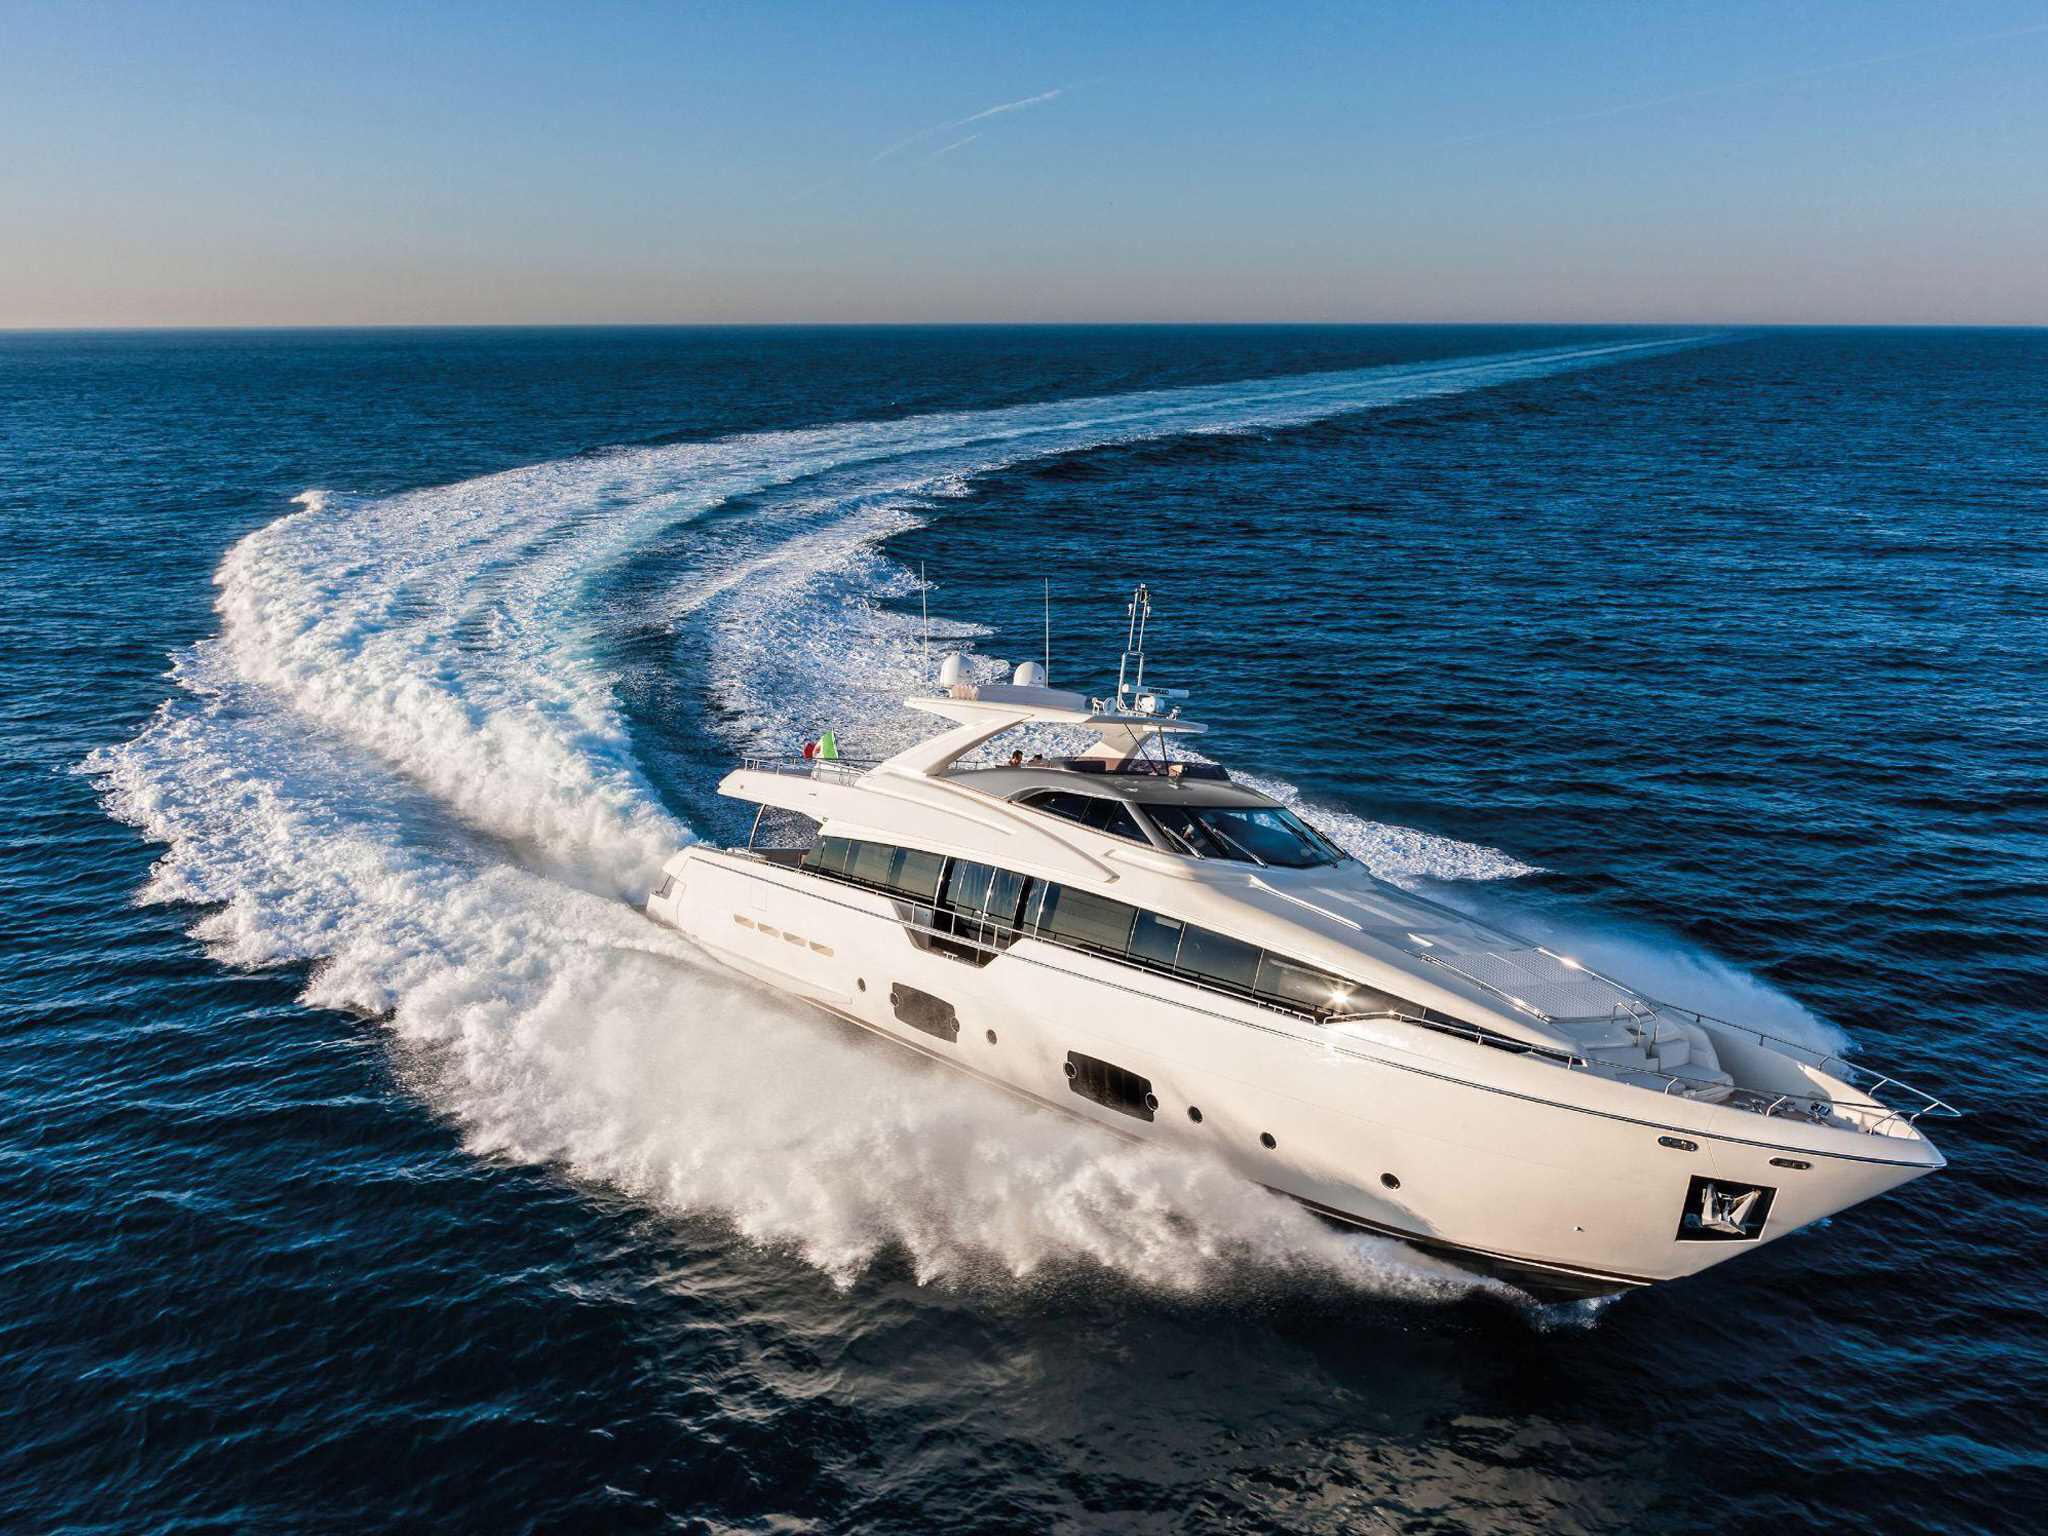 ferretti-yachts-ferretti yachts 960 ferretti group JMA Yachting Port Fréjus Var vente location neuf occasion places de port